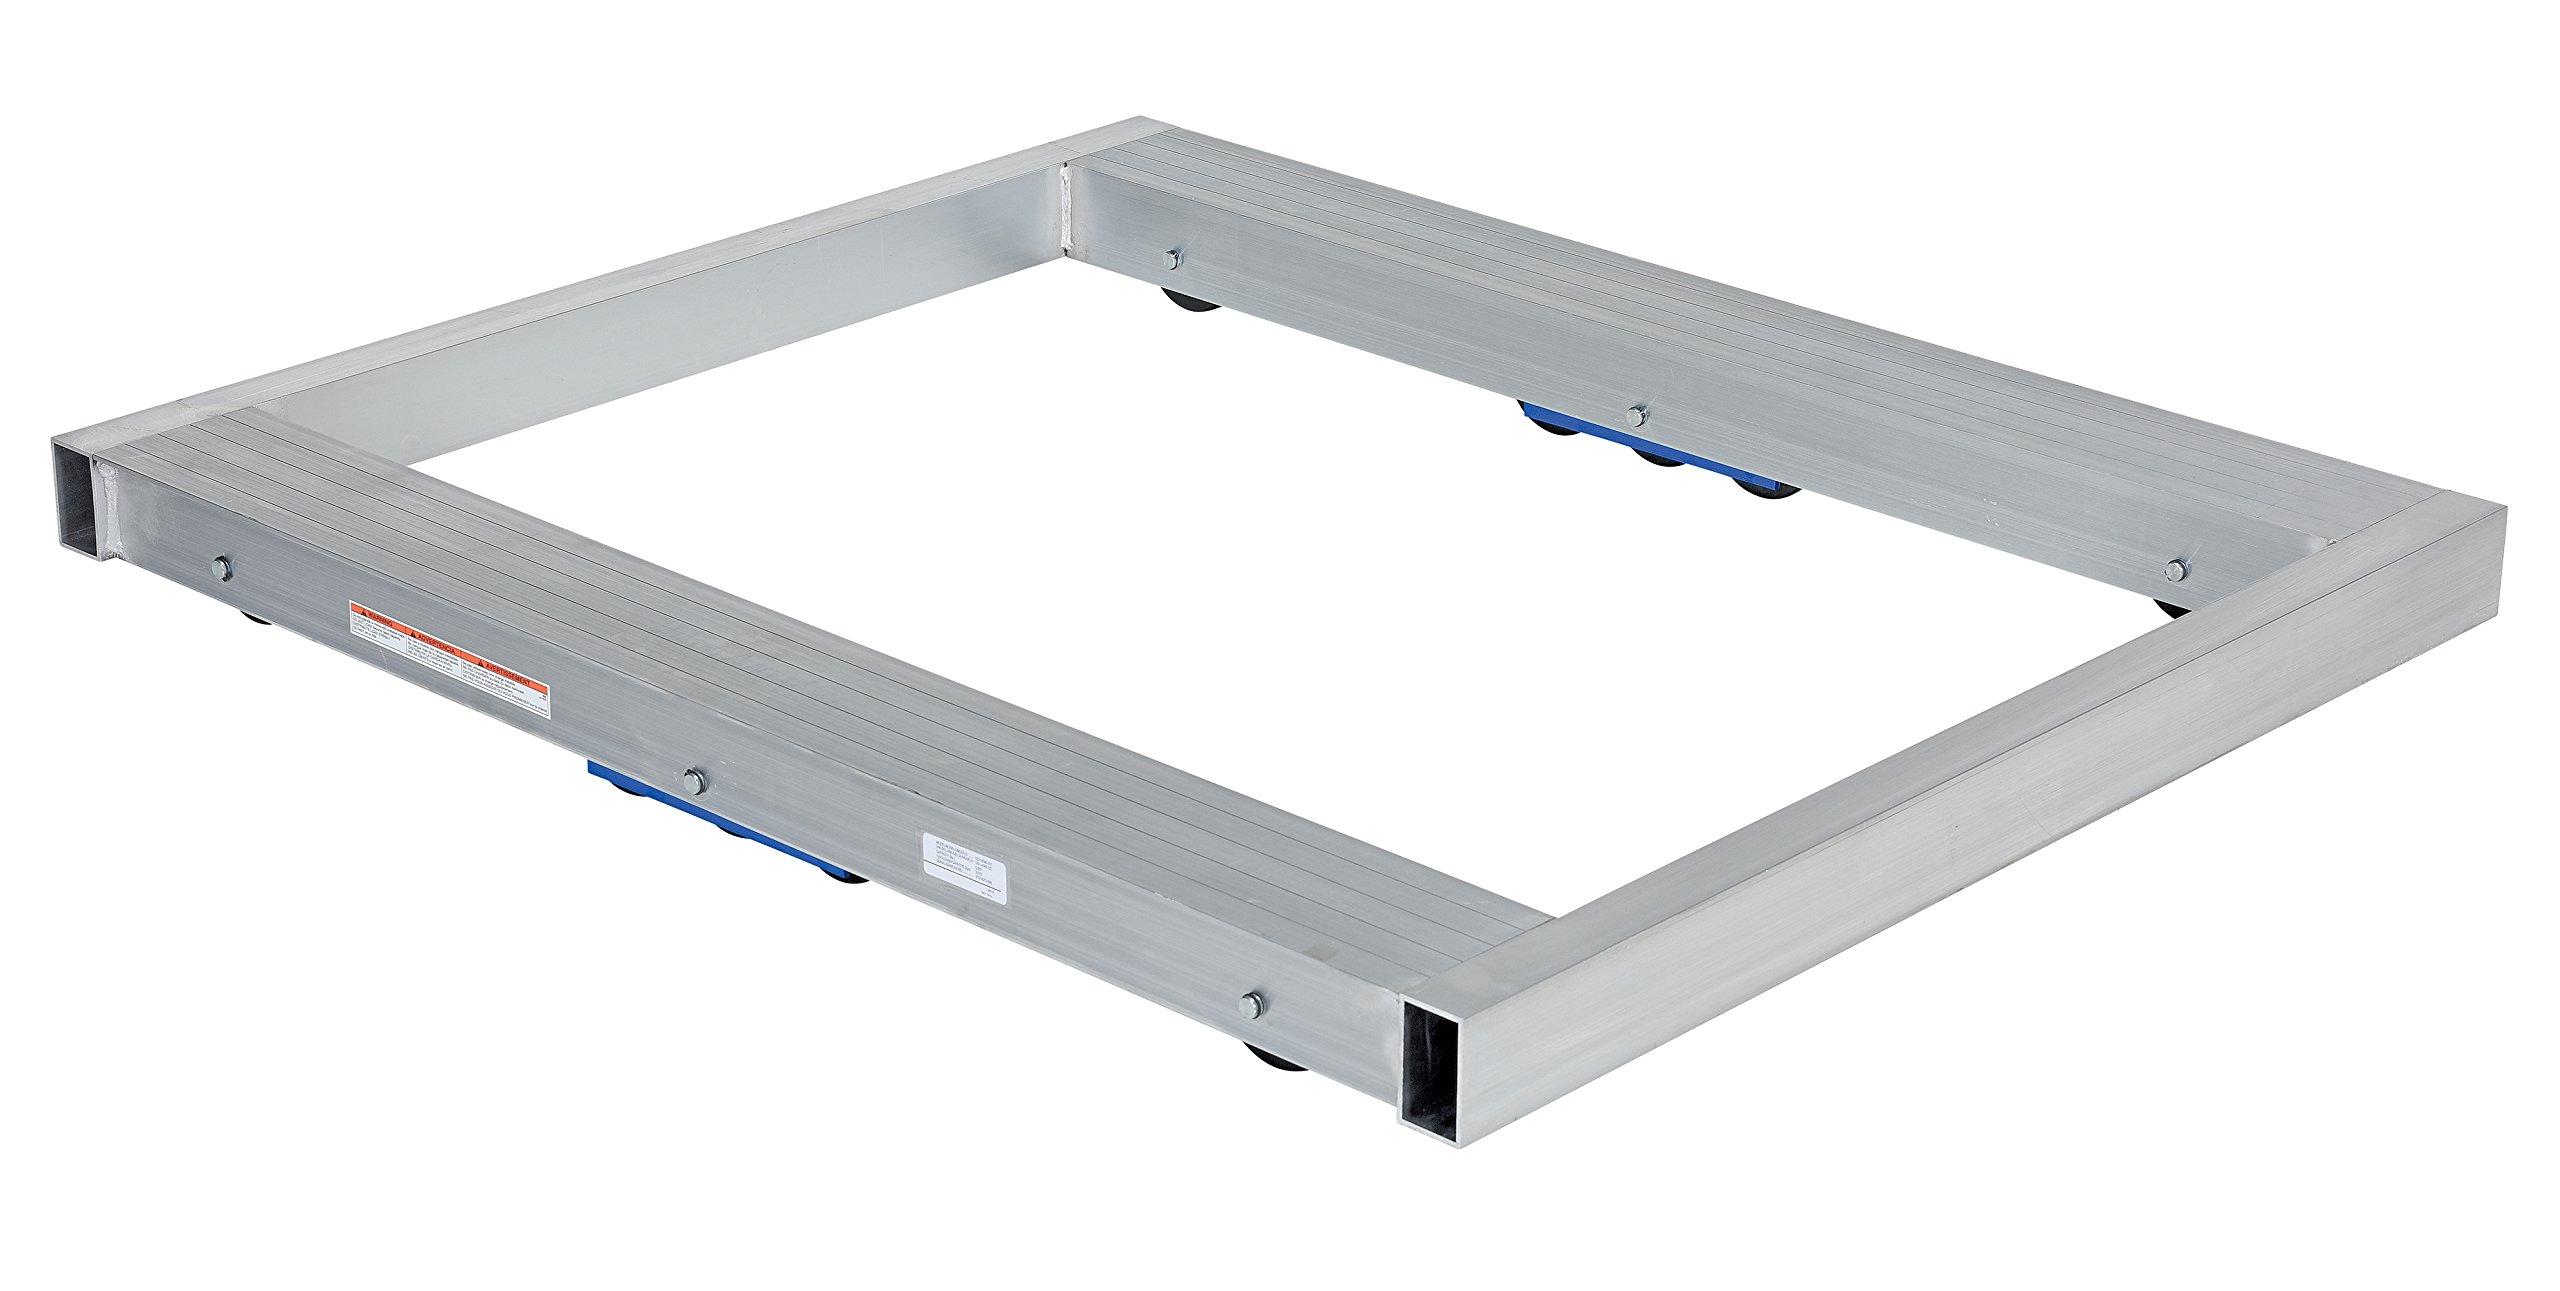 Vestil DOL-4048-10T Pallet Dolly, Tilting, Aluminum, 8,000 lb. Capacity, 4-1/8 x 40 x 48'' by Vestil